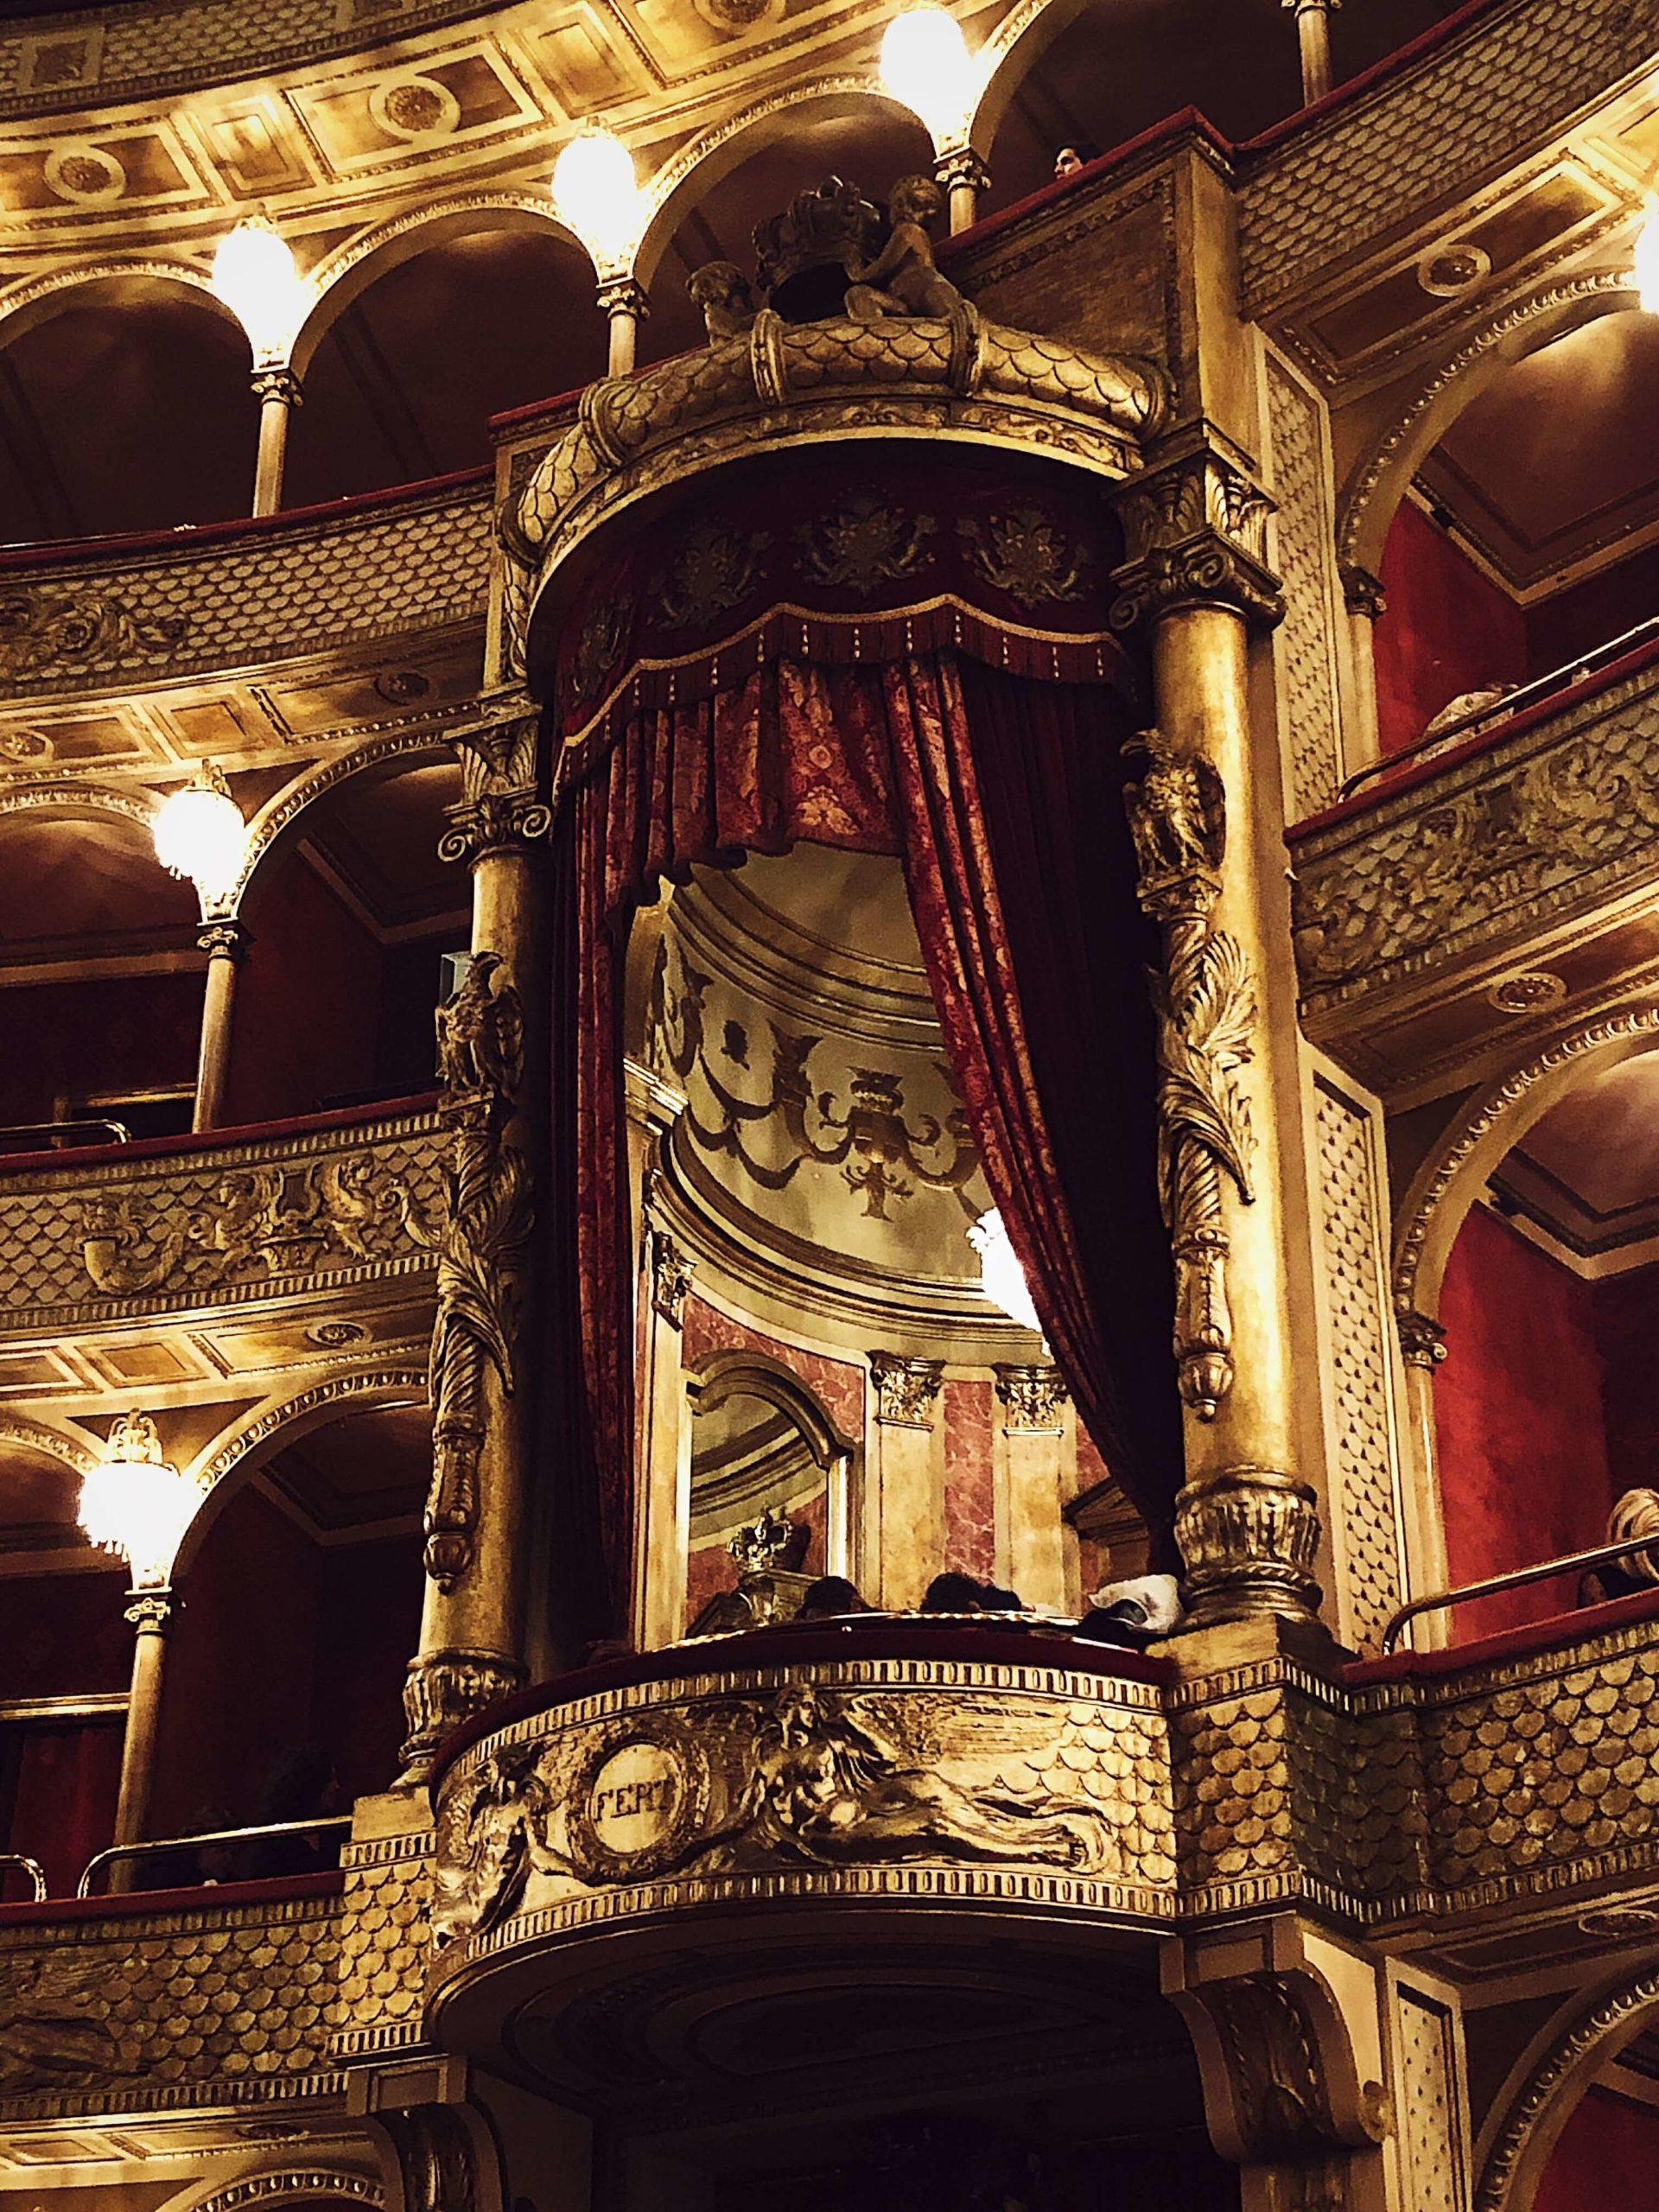 Rome's opera house